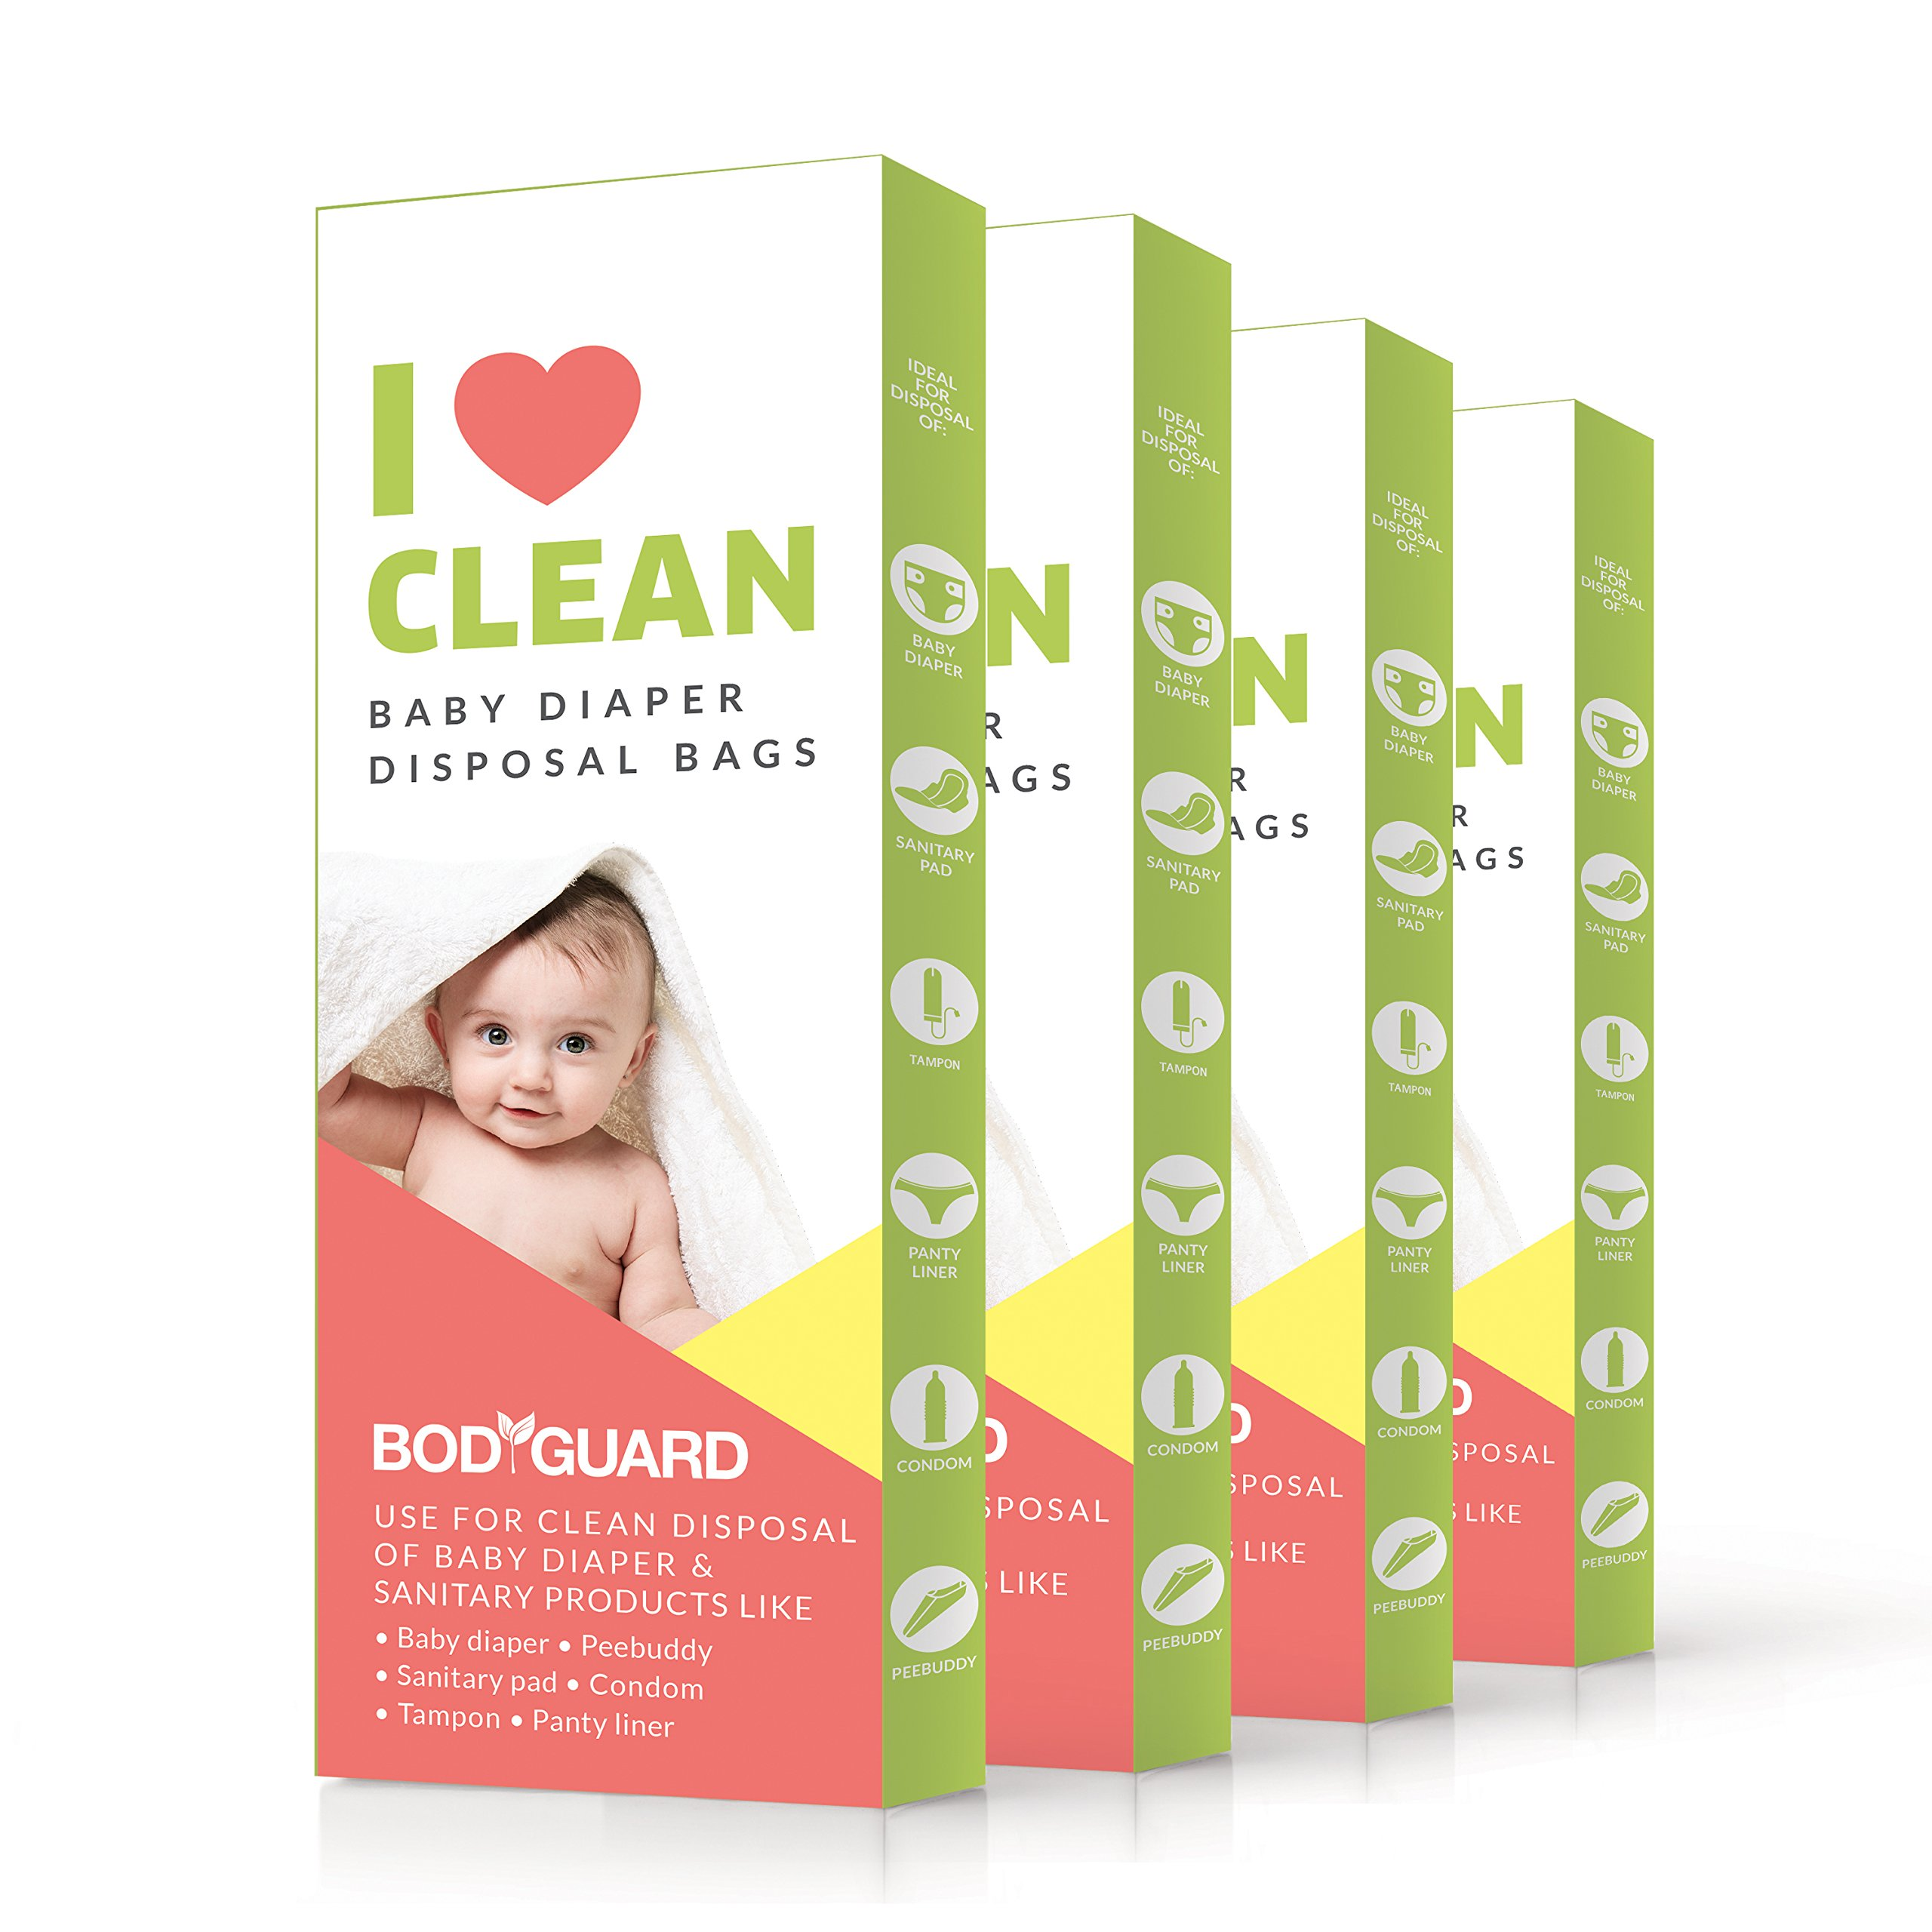 Bodyguard baby diaper disposable bags